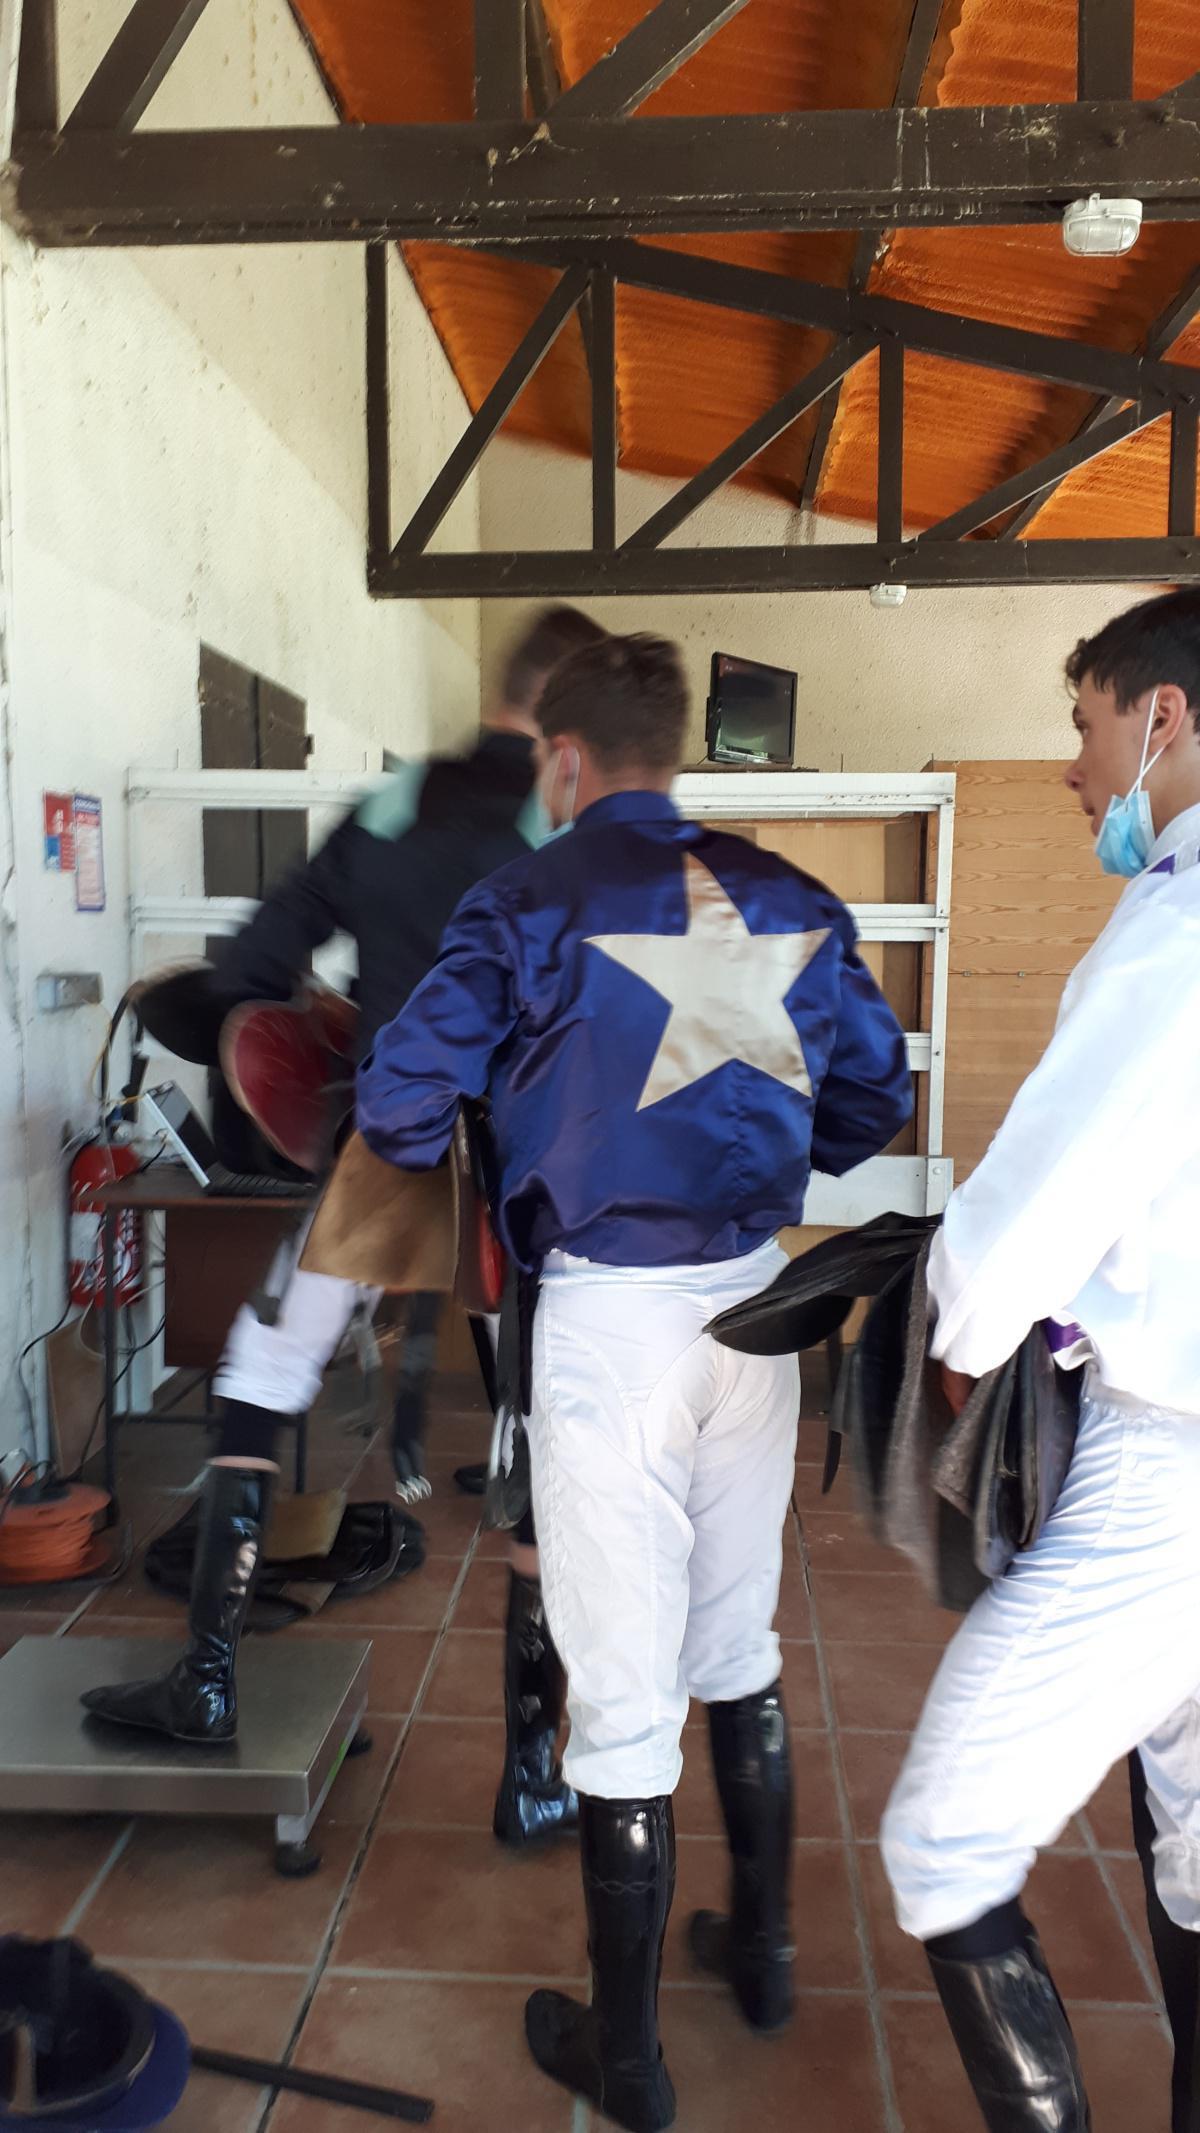 La pesée des jockeys